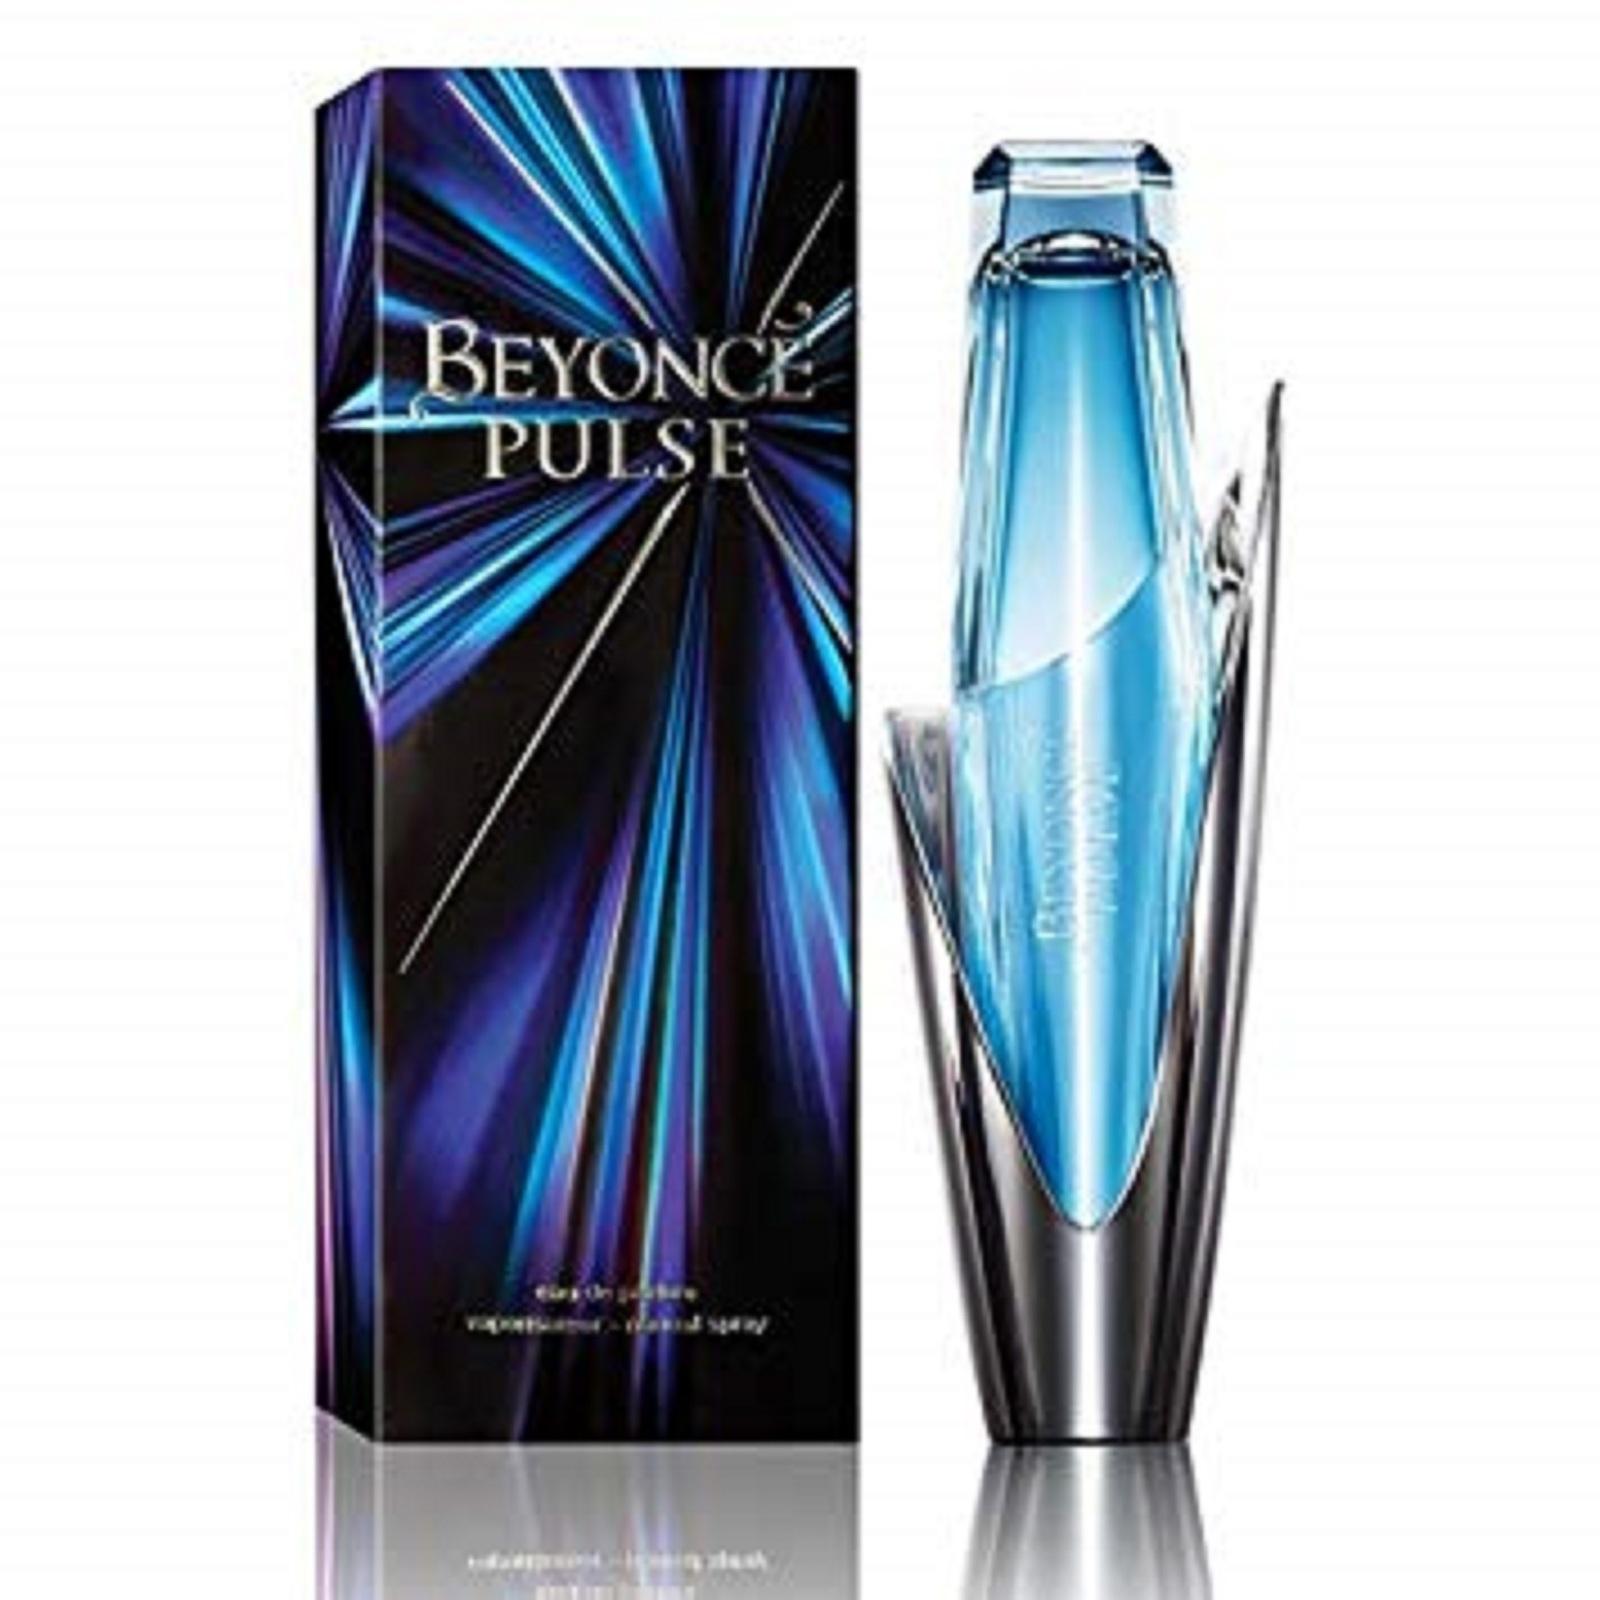 Beyonce - Pulse (100ml EDP) image